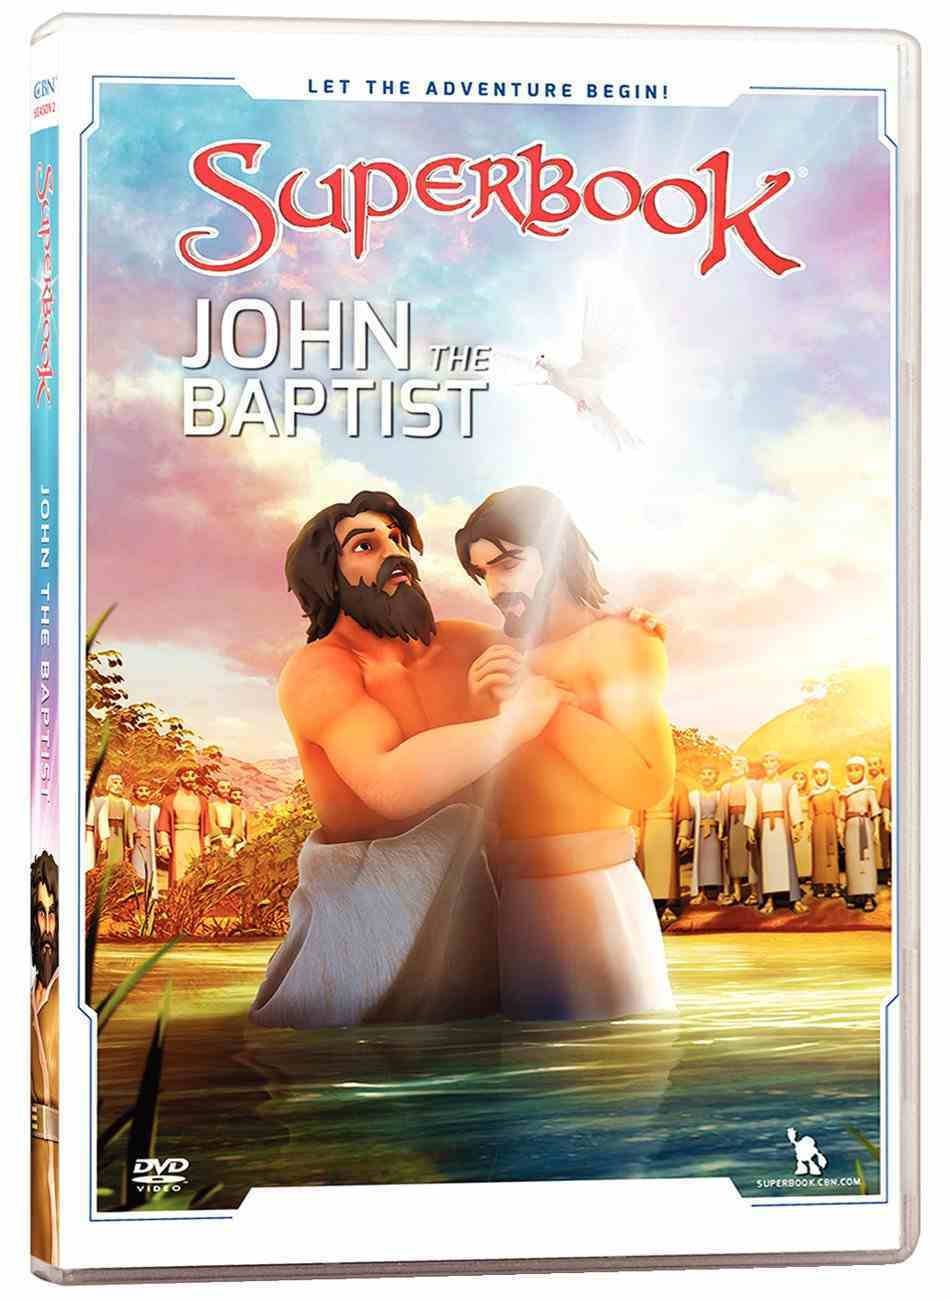 John the Baptist (#06 in Superbook Dvd Series Season 02) DVD